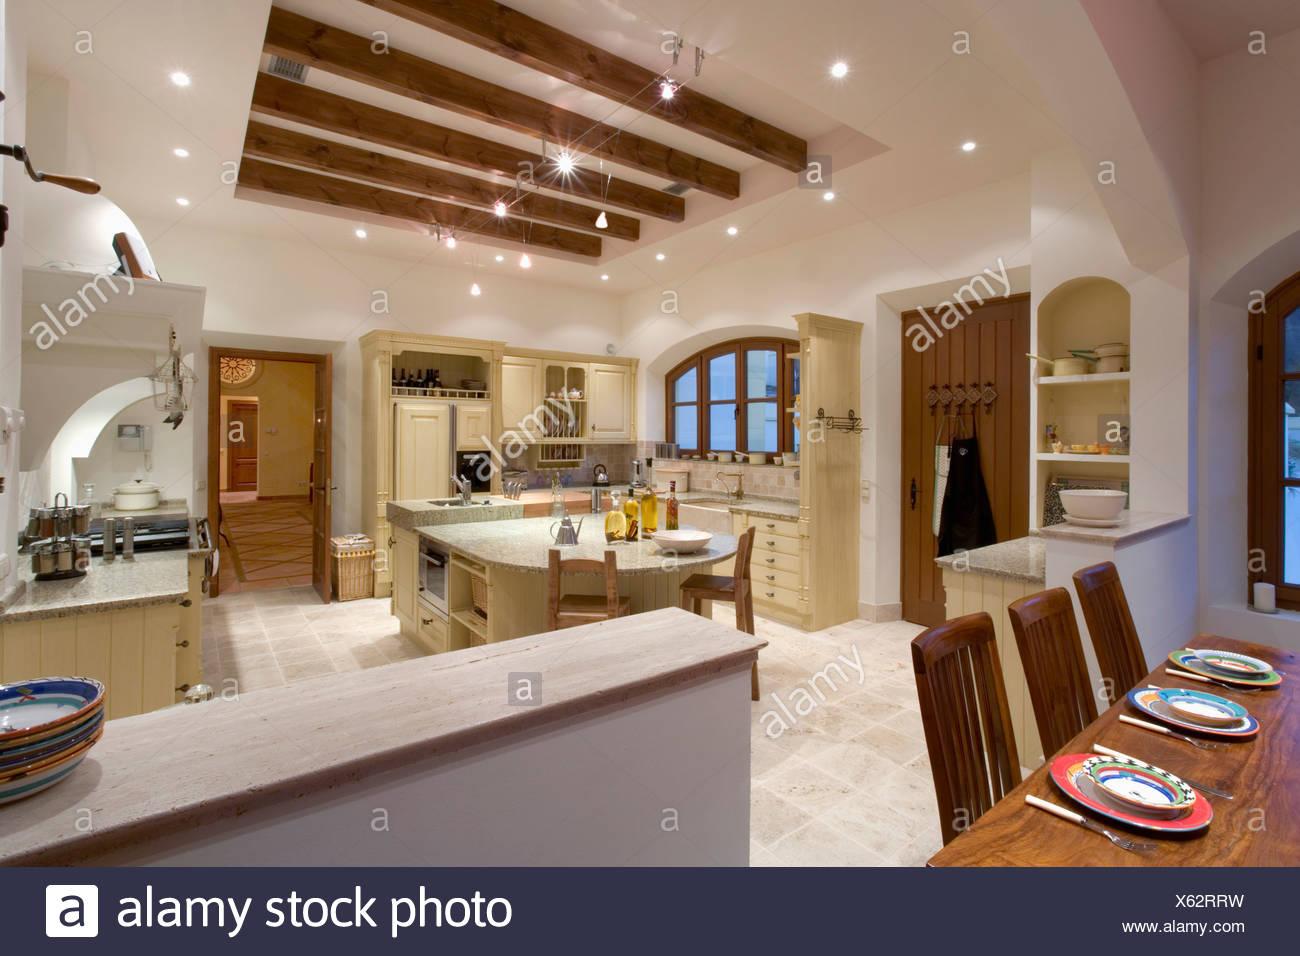 grande cuisine salle manger en espagnol moderne villa avec clairage au plafond avec des. Black Bedroom Furniture Sets. Home Design Ideas